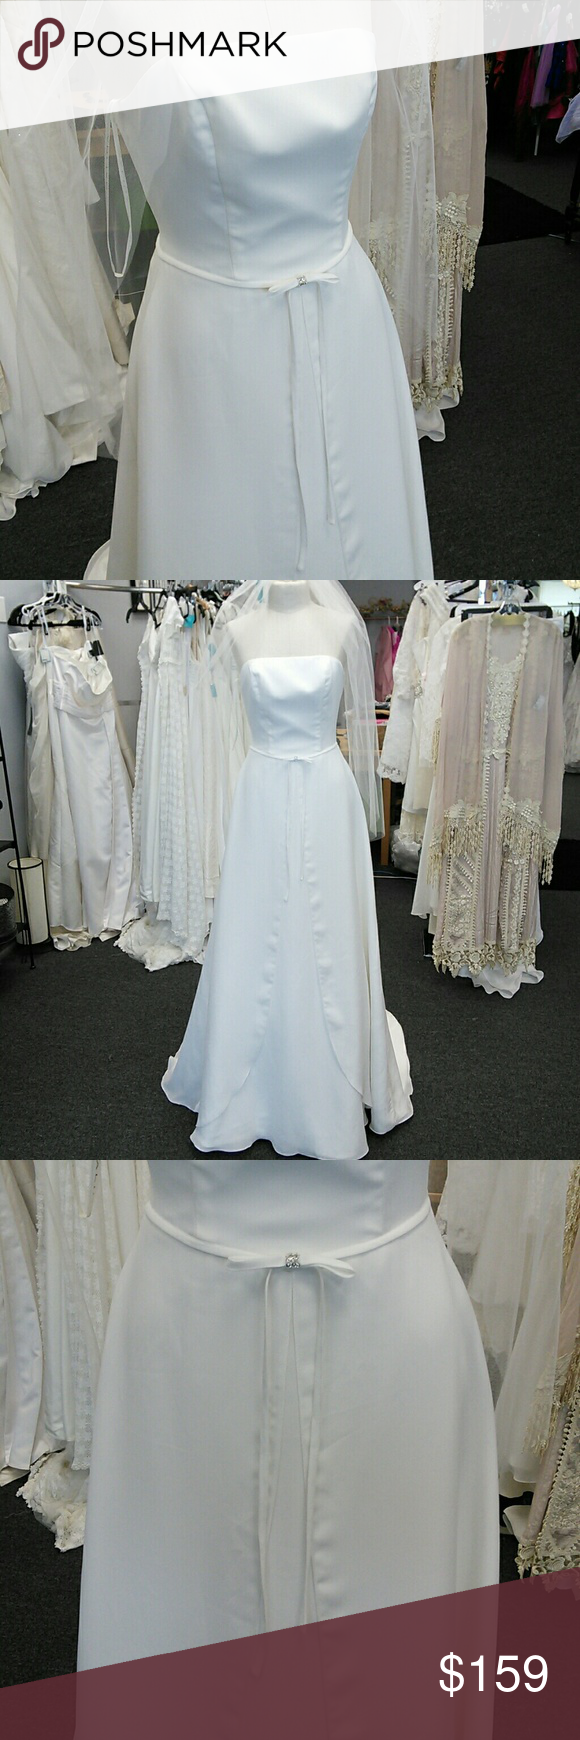 Soft chiffon wedding dress NWT   Chiffon wedding dresses and Wedding ...